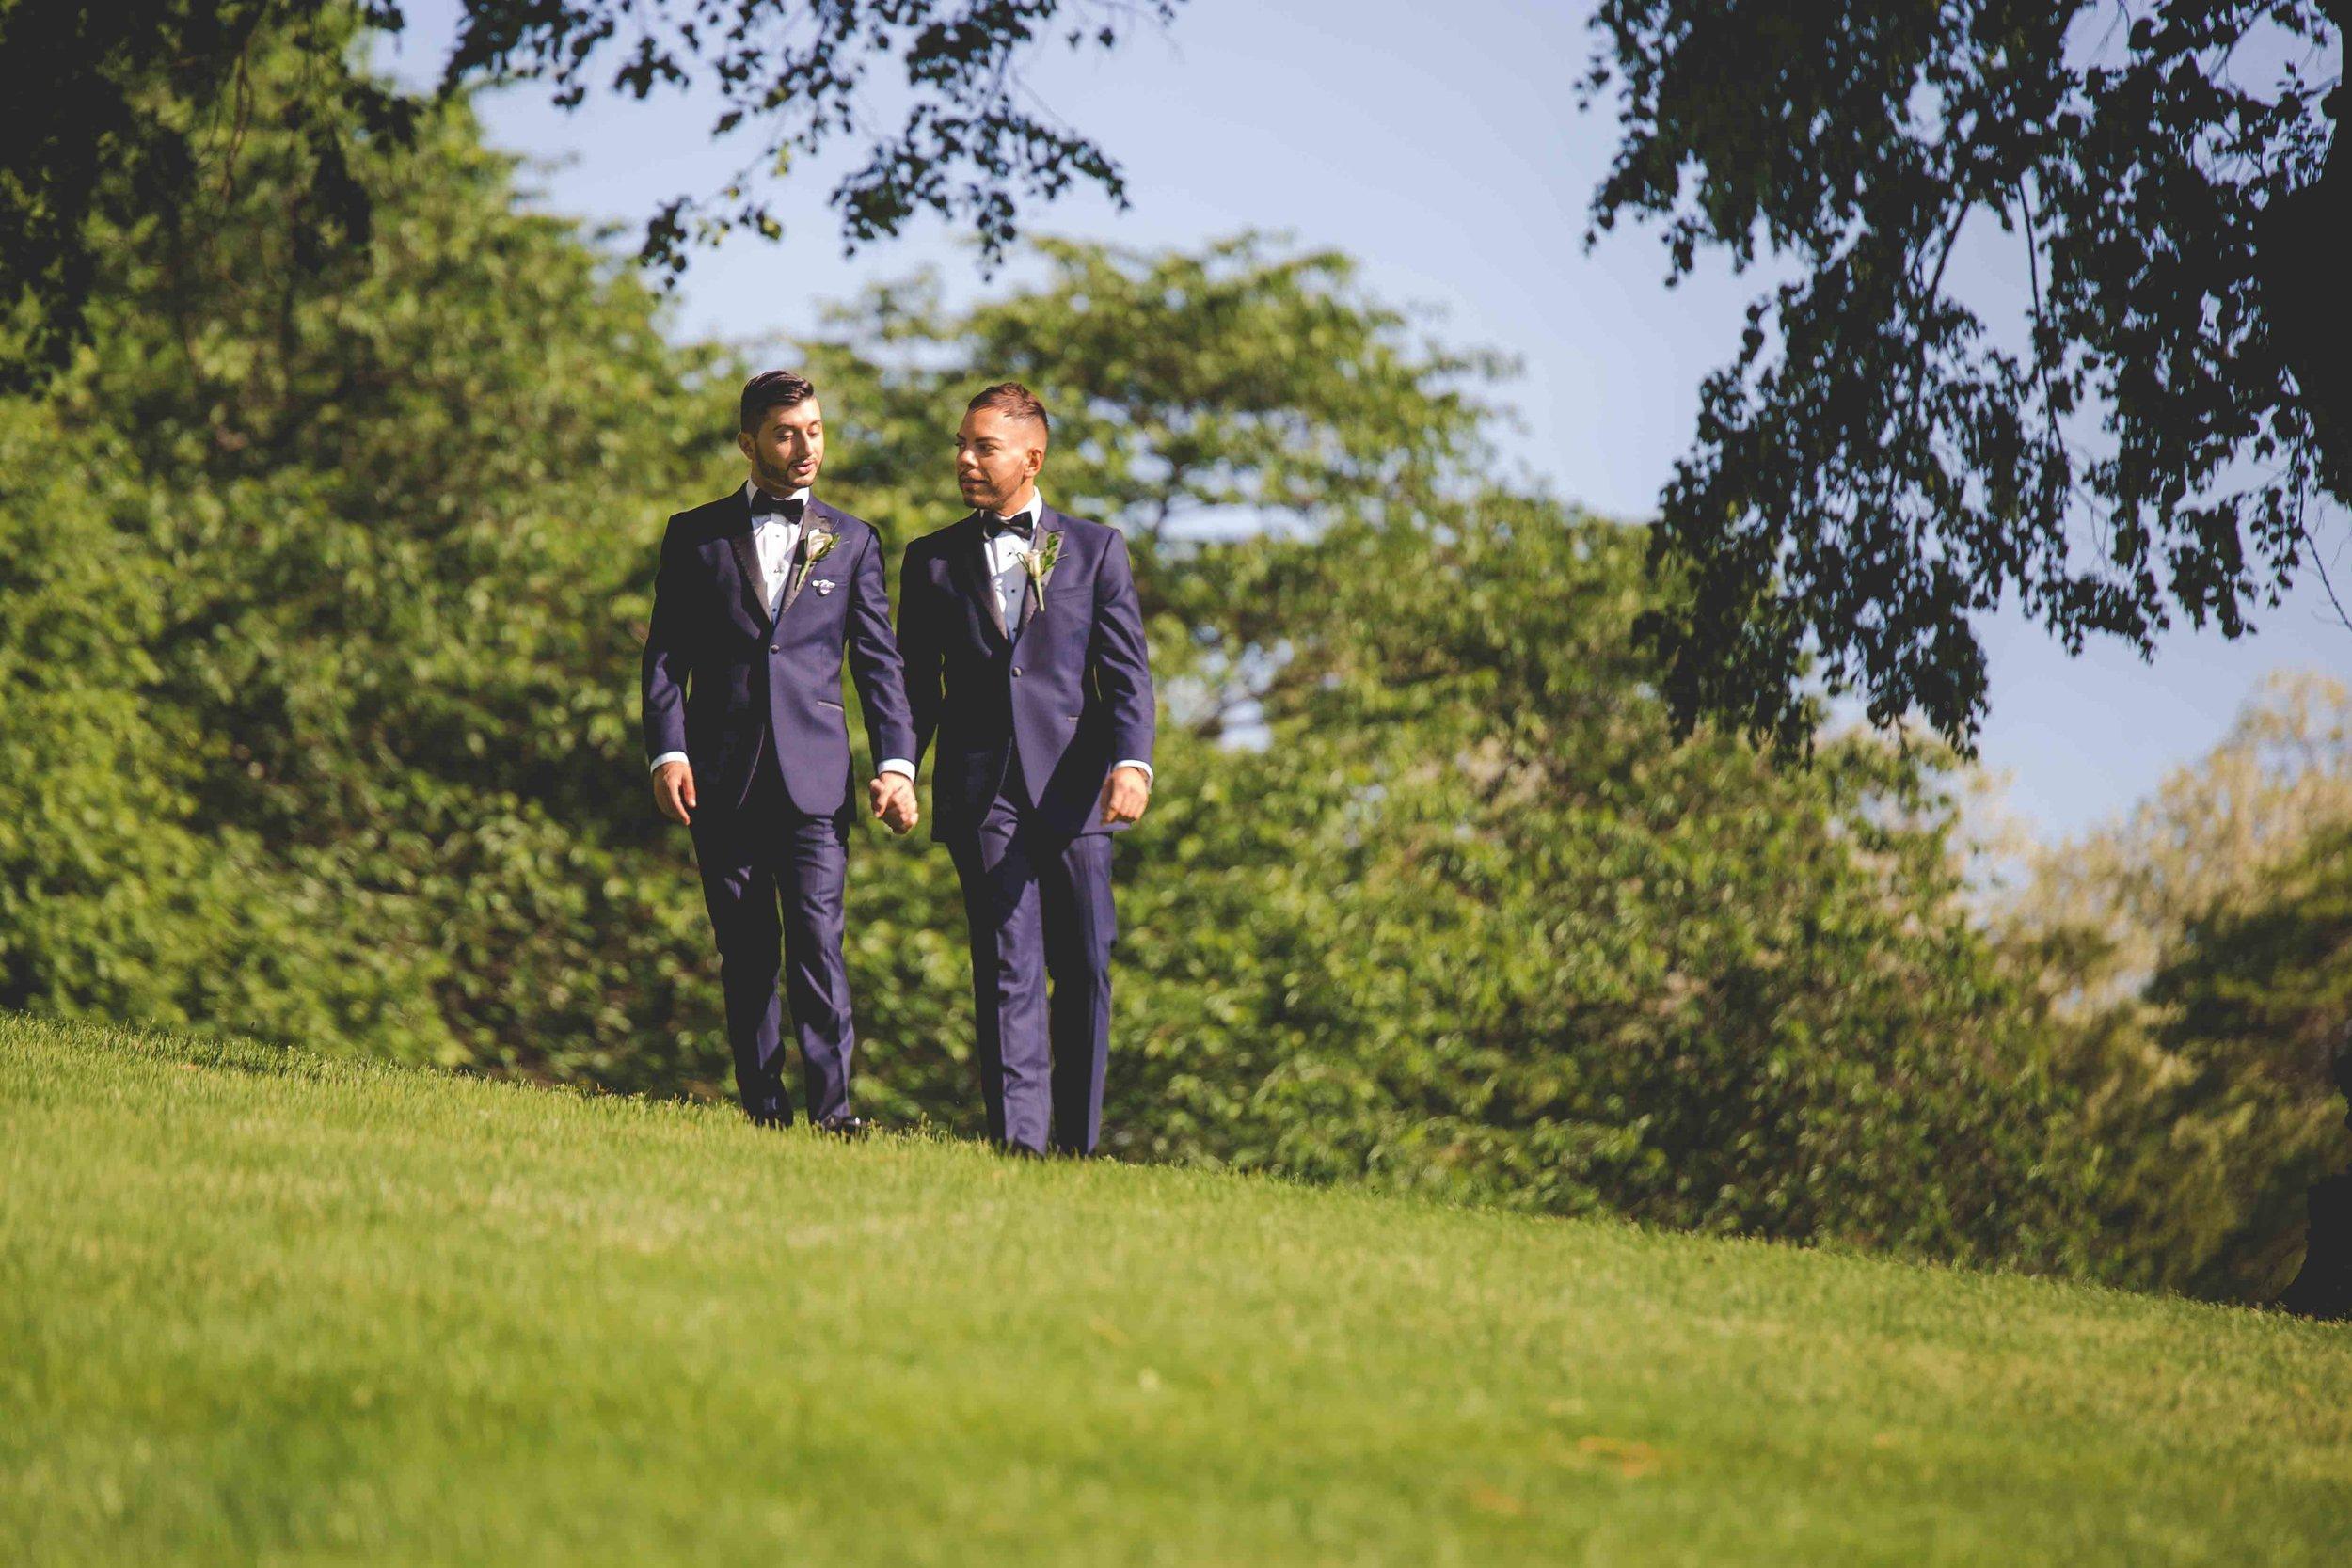 lyndhurst-mansion-amazing-gay-wedding-16.jpg